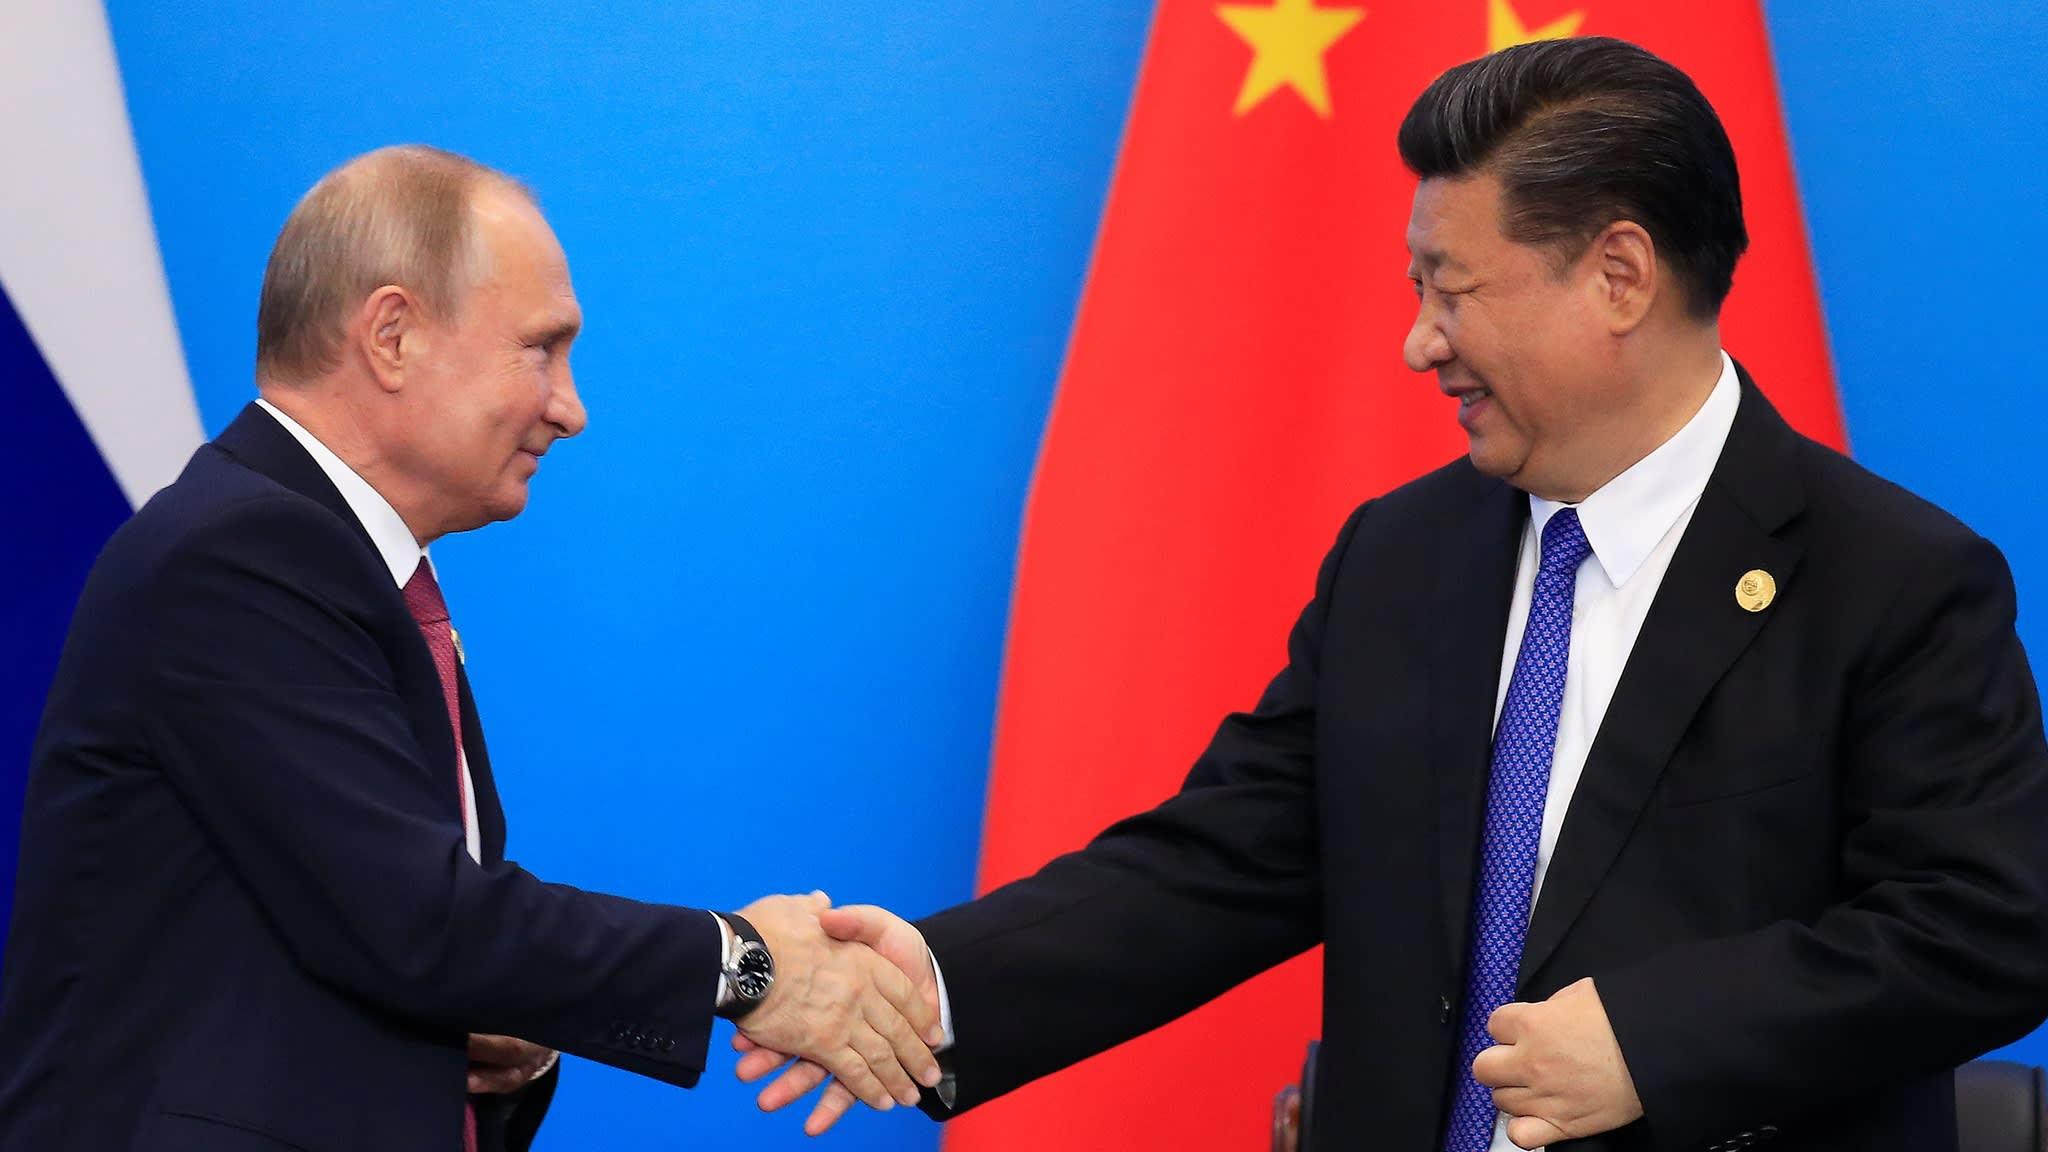 Xi Jinping and Putin